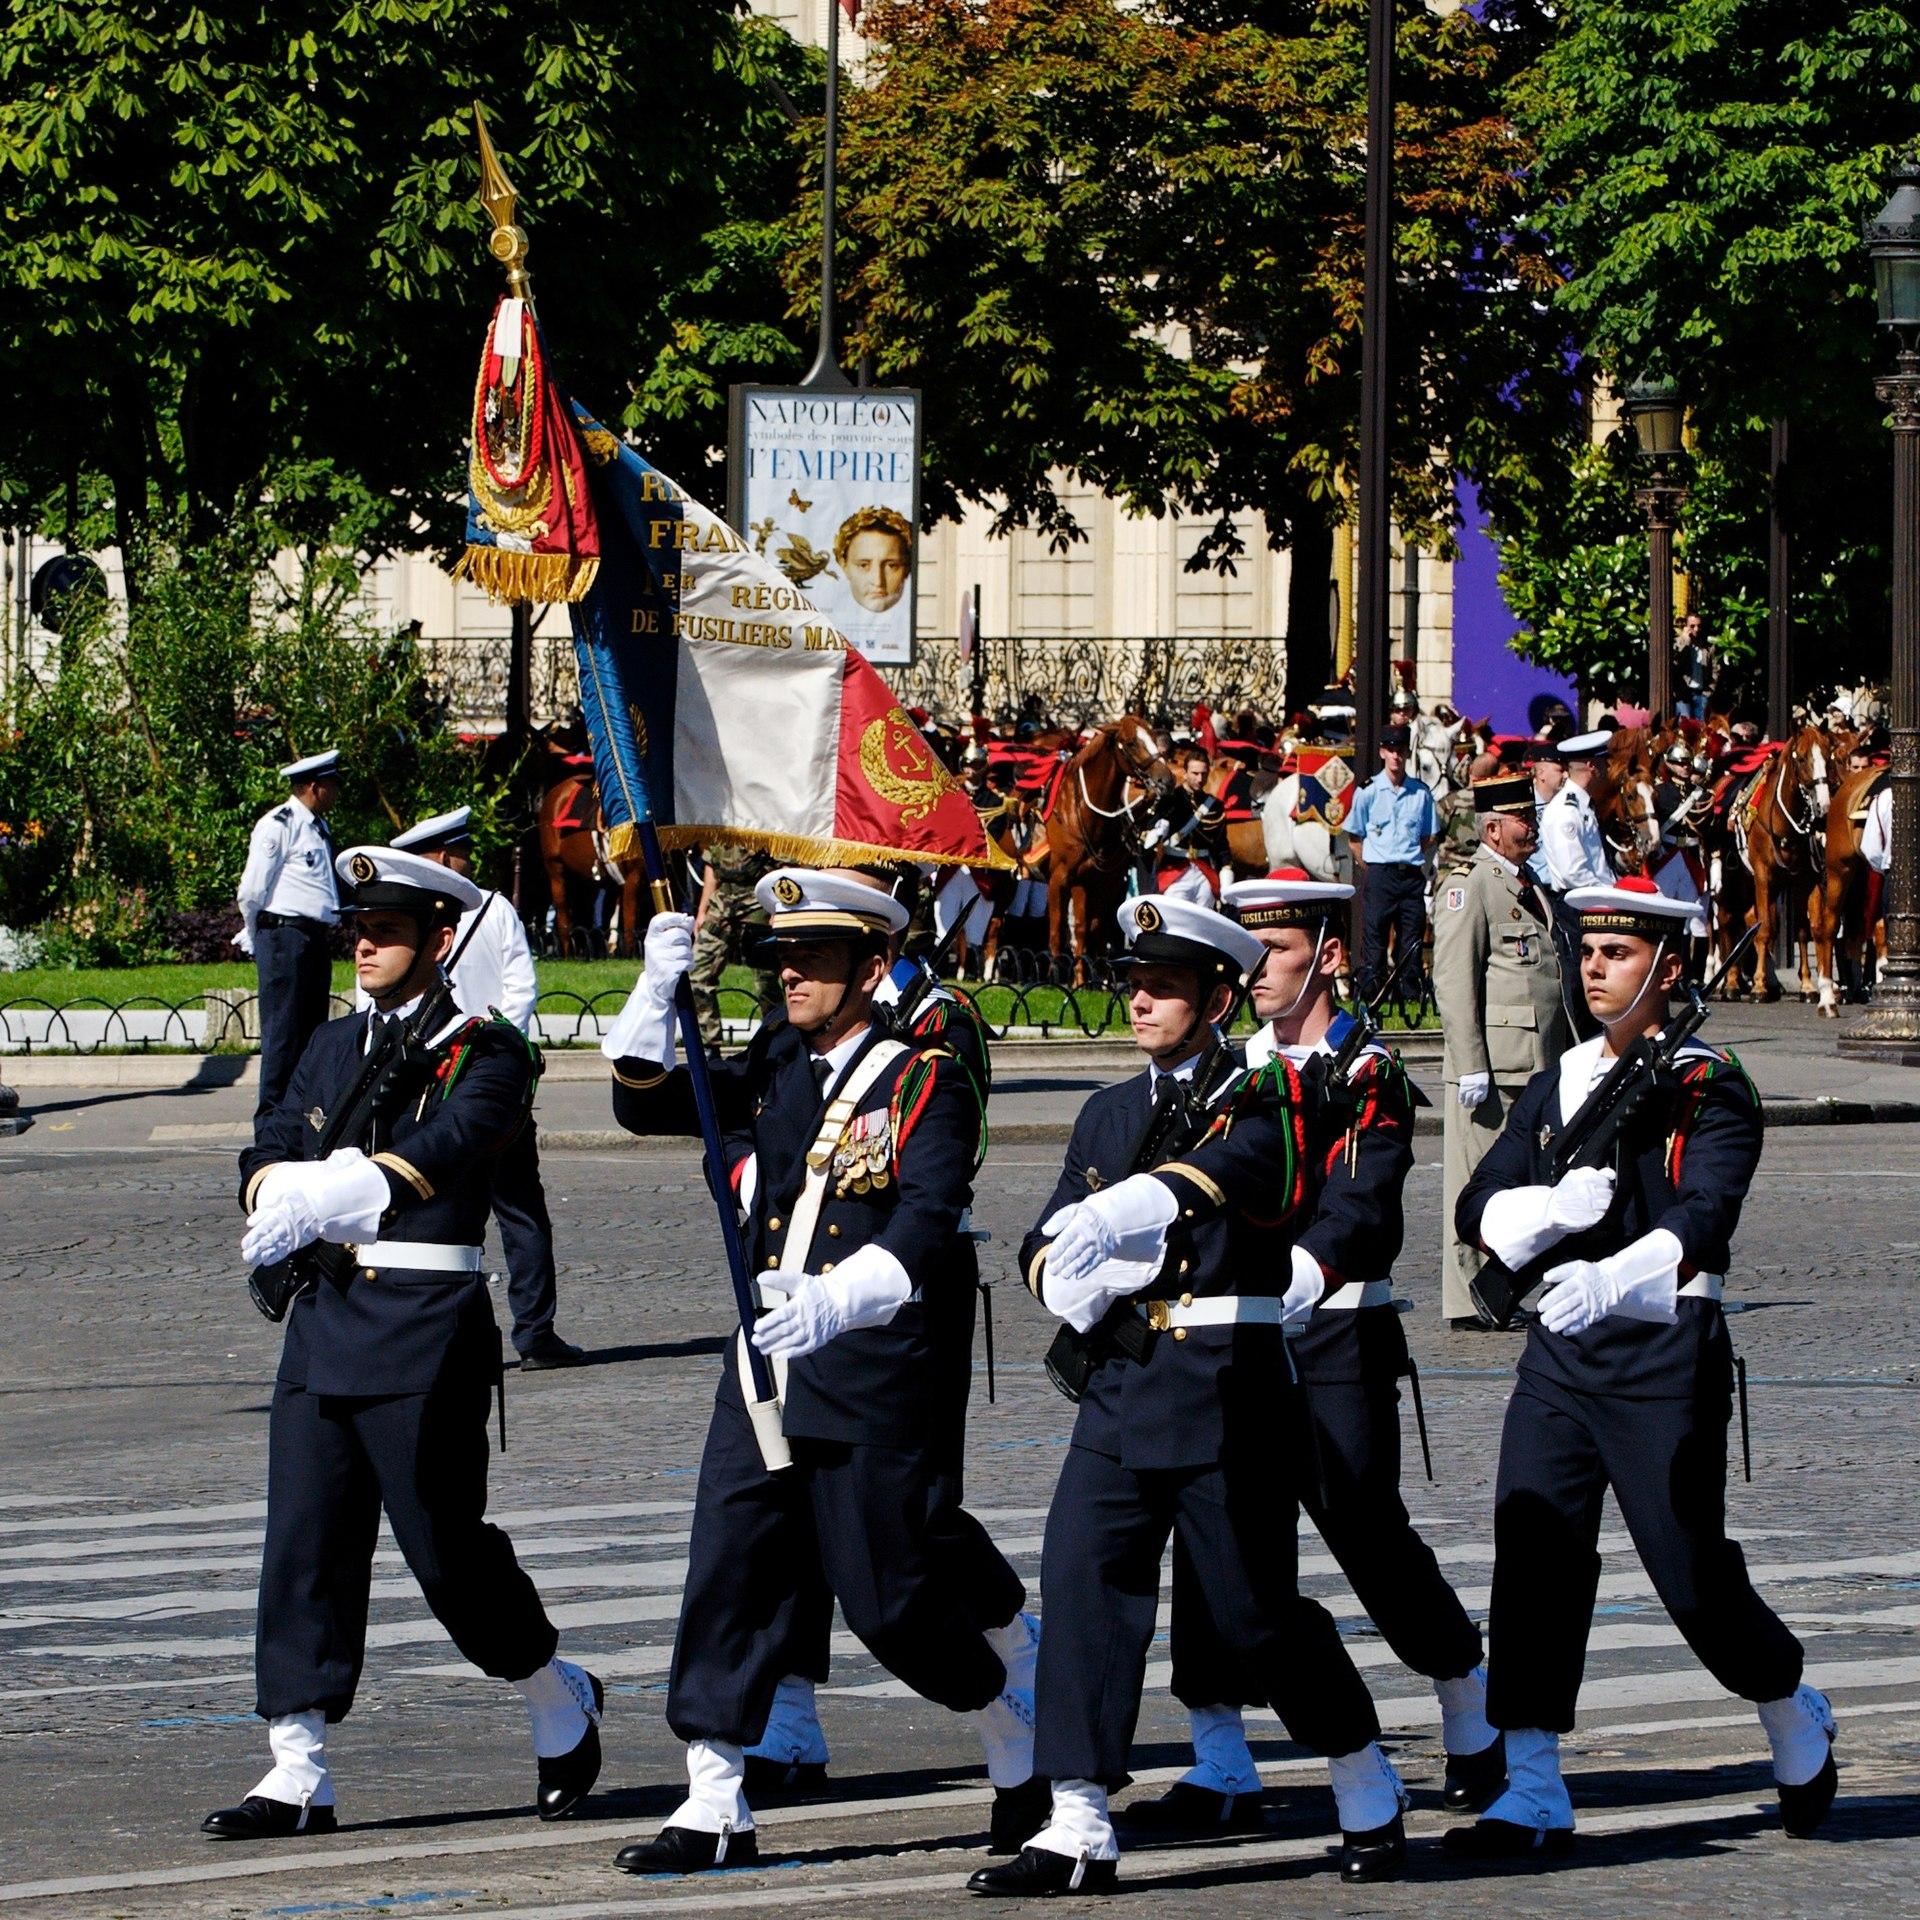 Color guard flags